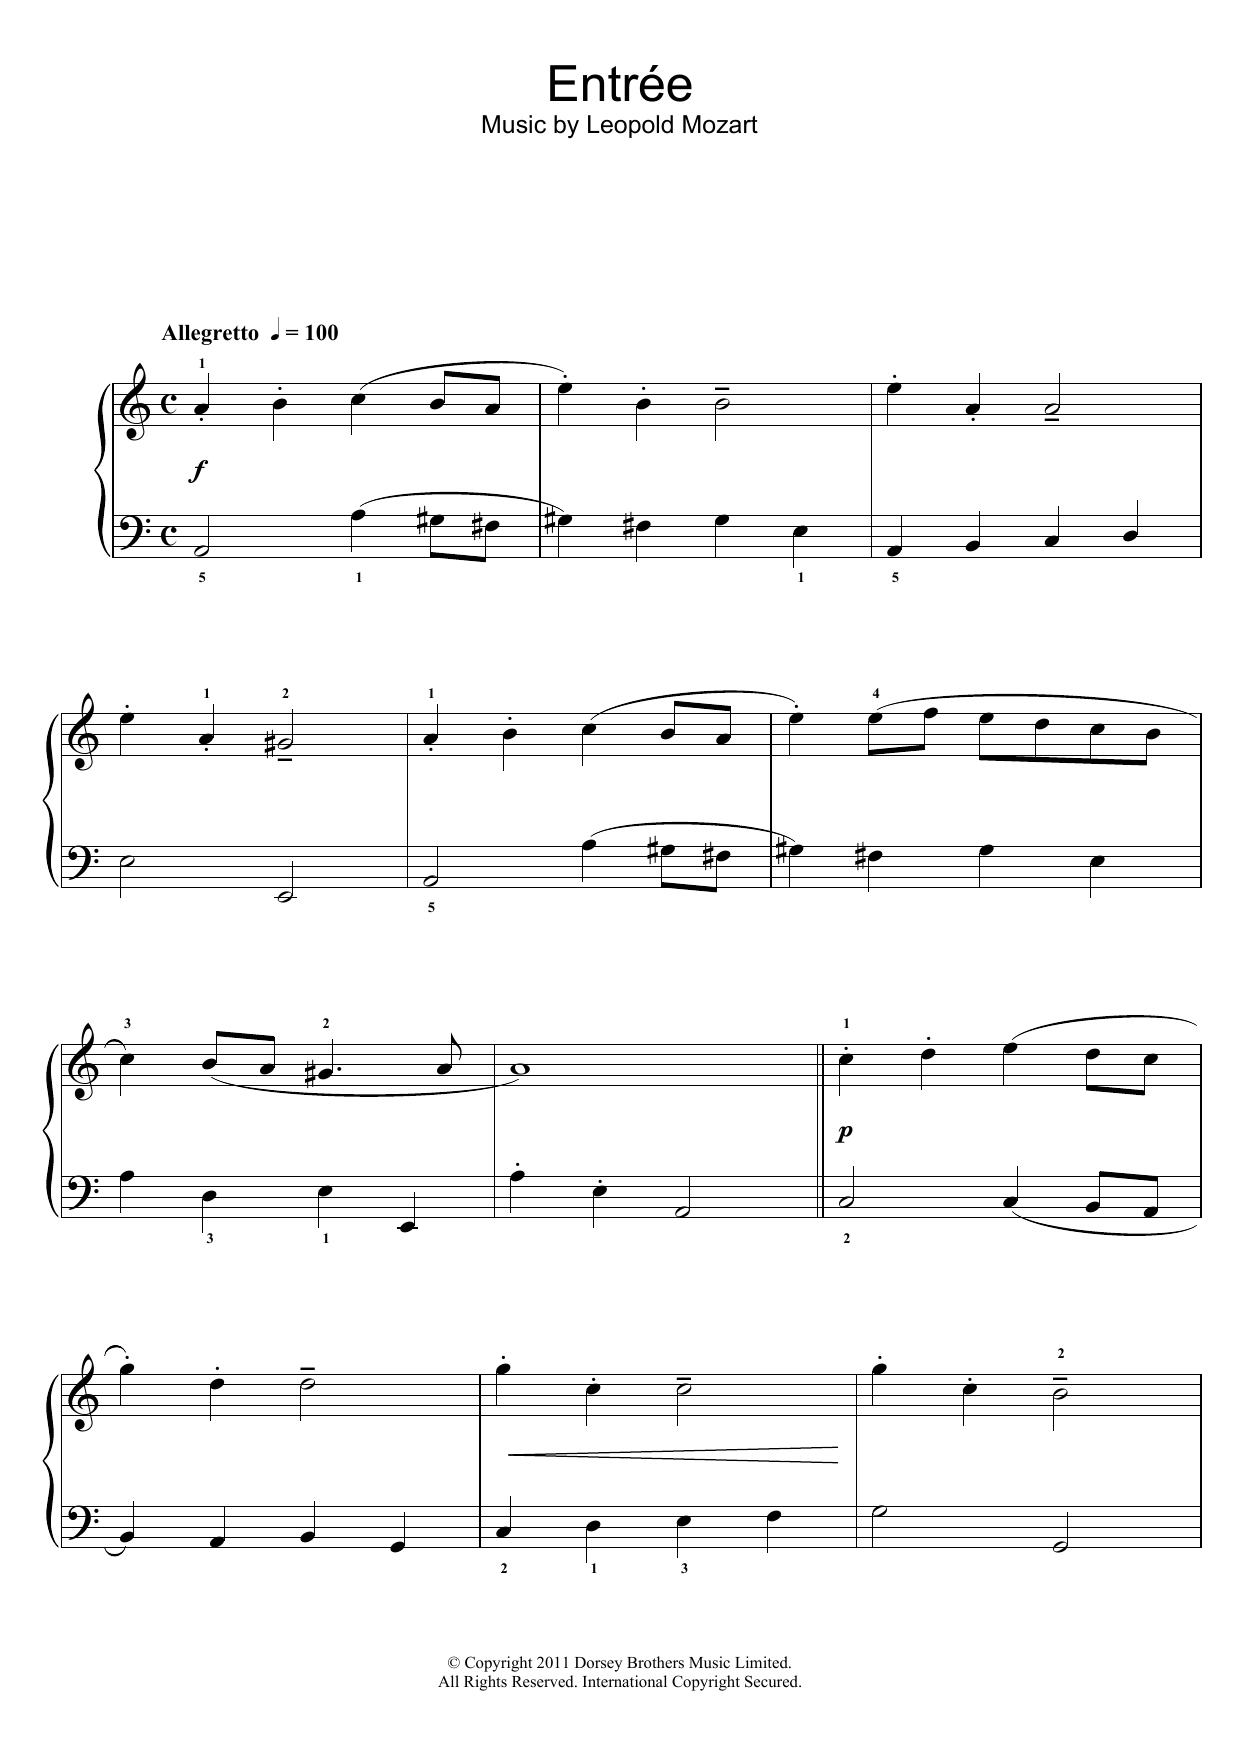 Leopold Mozart - Entree